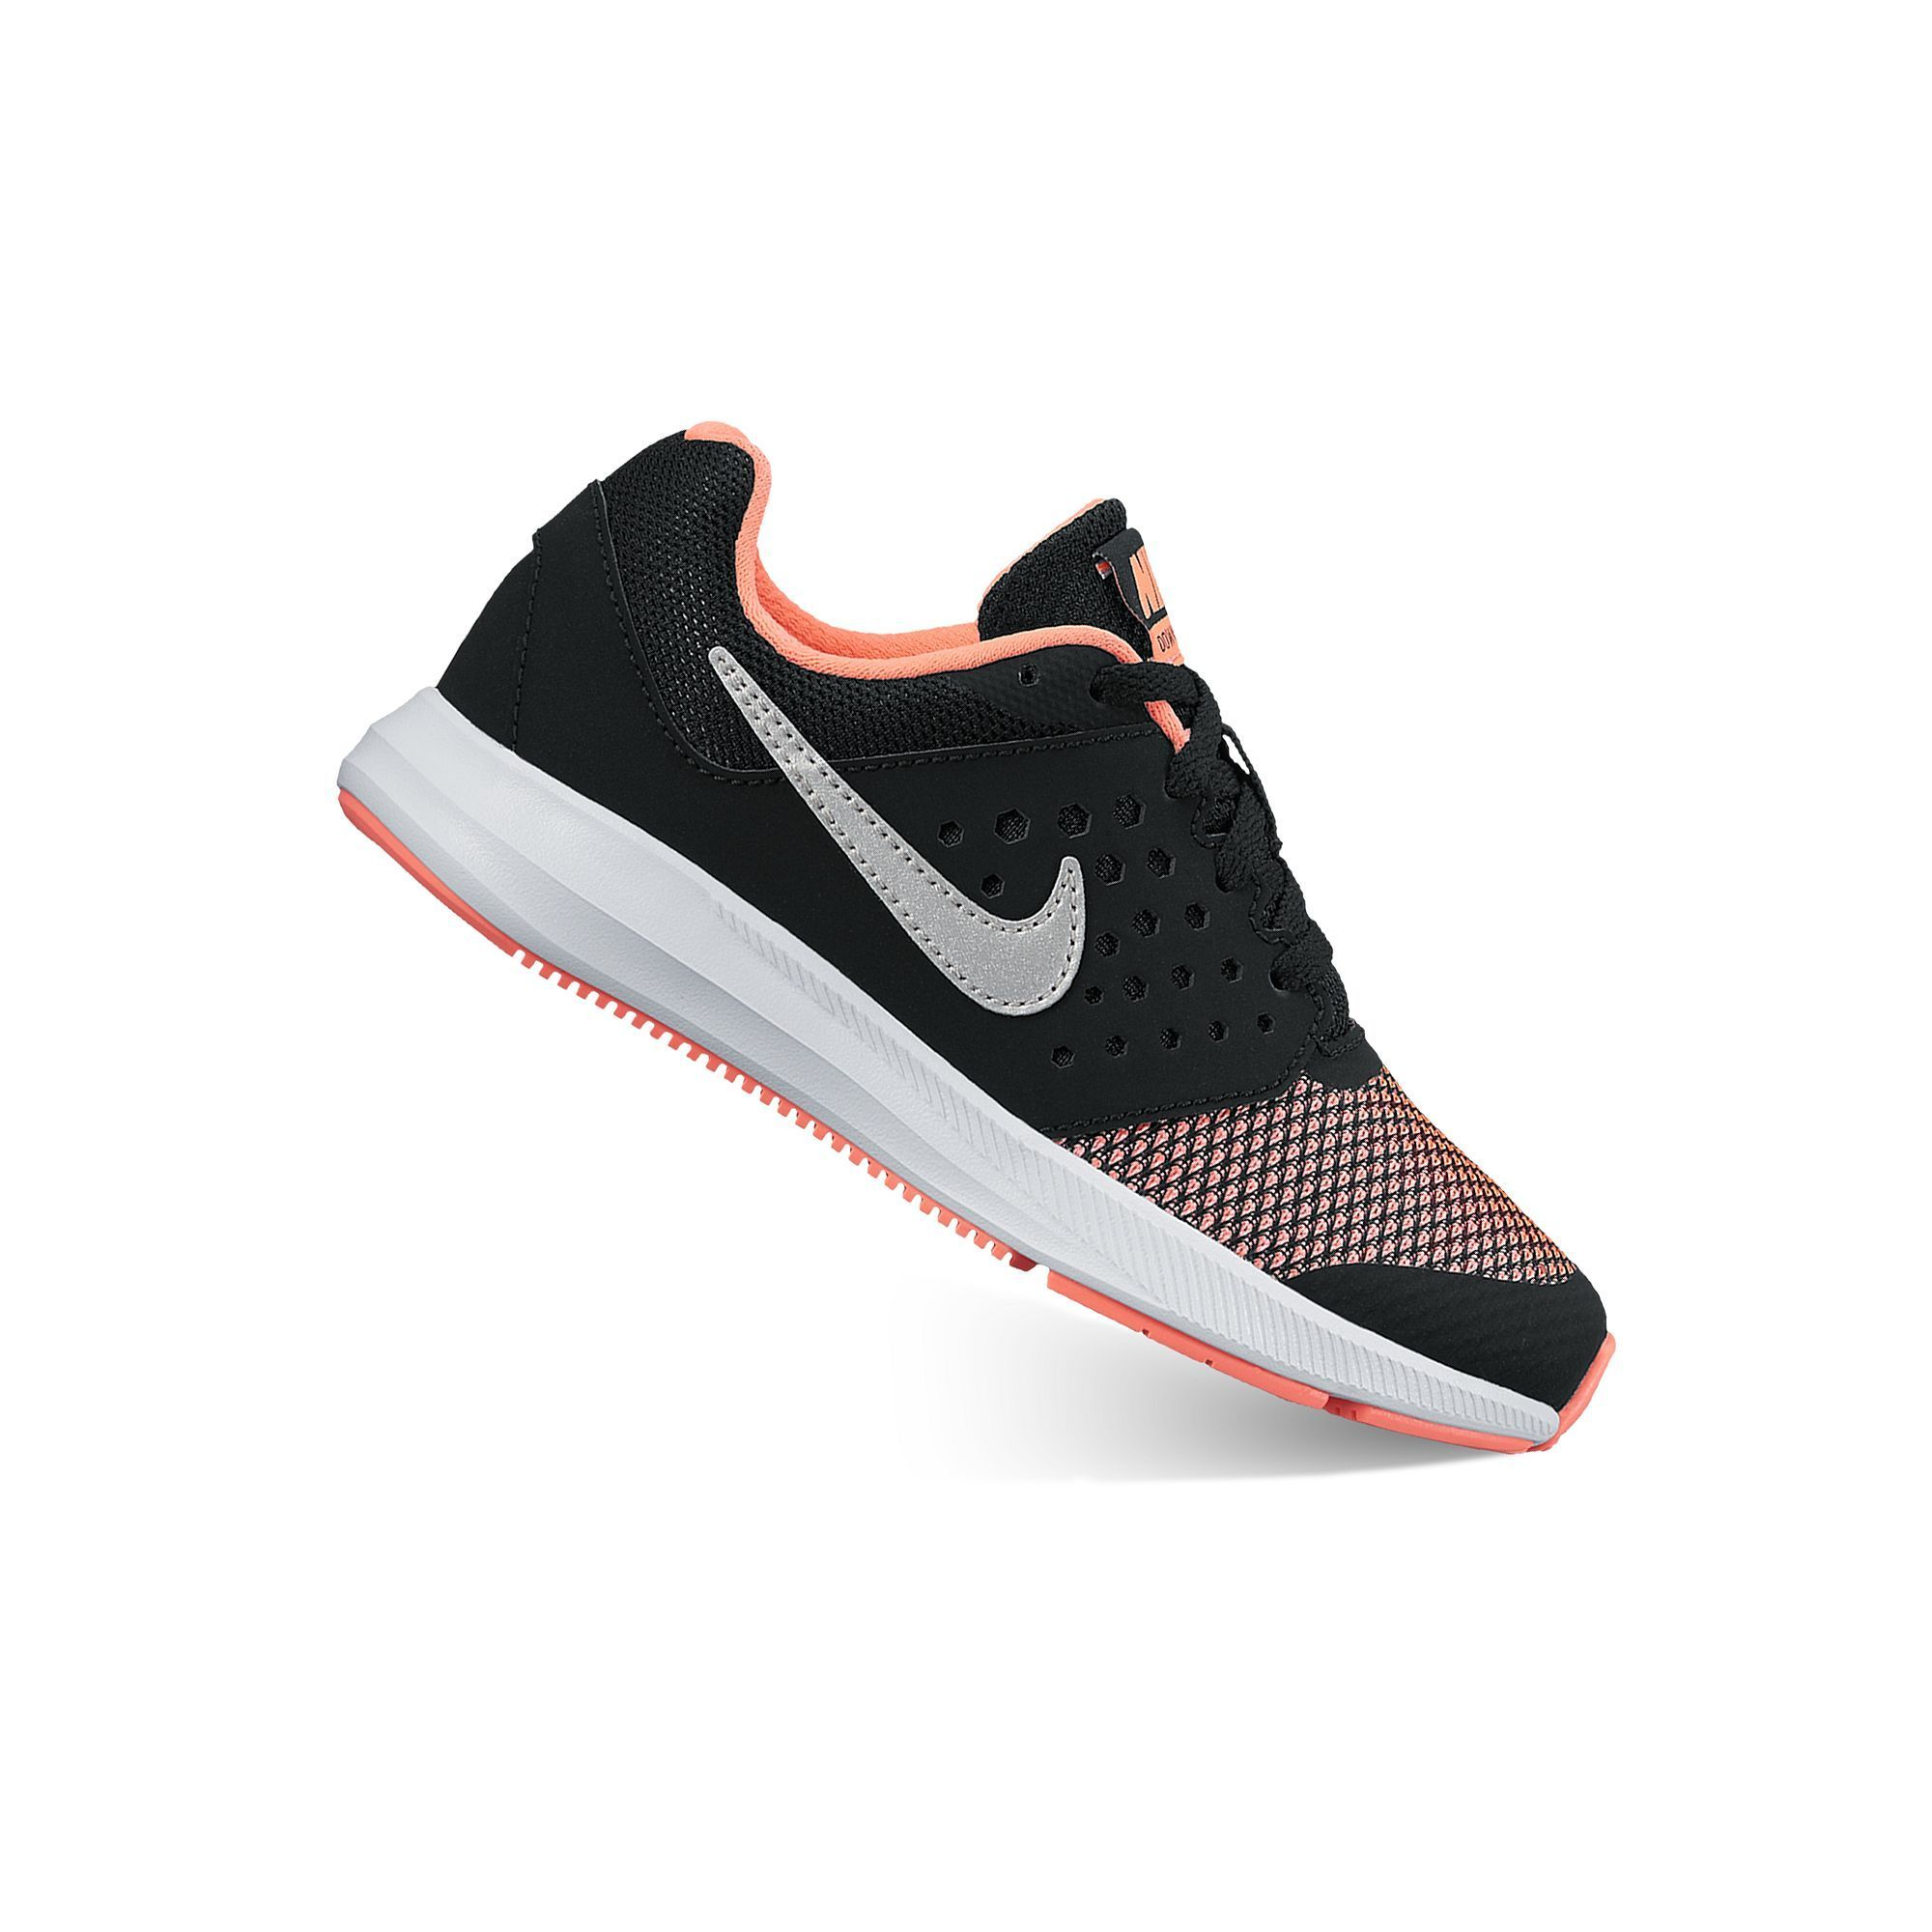 wholesale dealer 81622 c7510 Nike Downshifter 7 Preschool Girls  Lace-Up Shoes, Size  11, Black